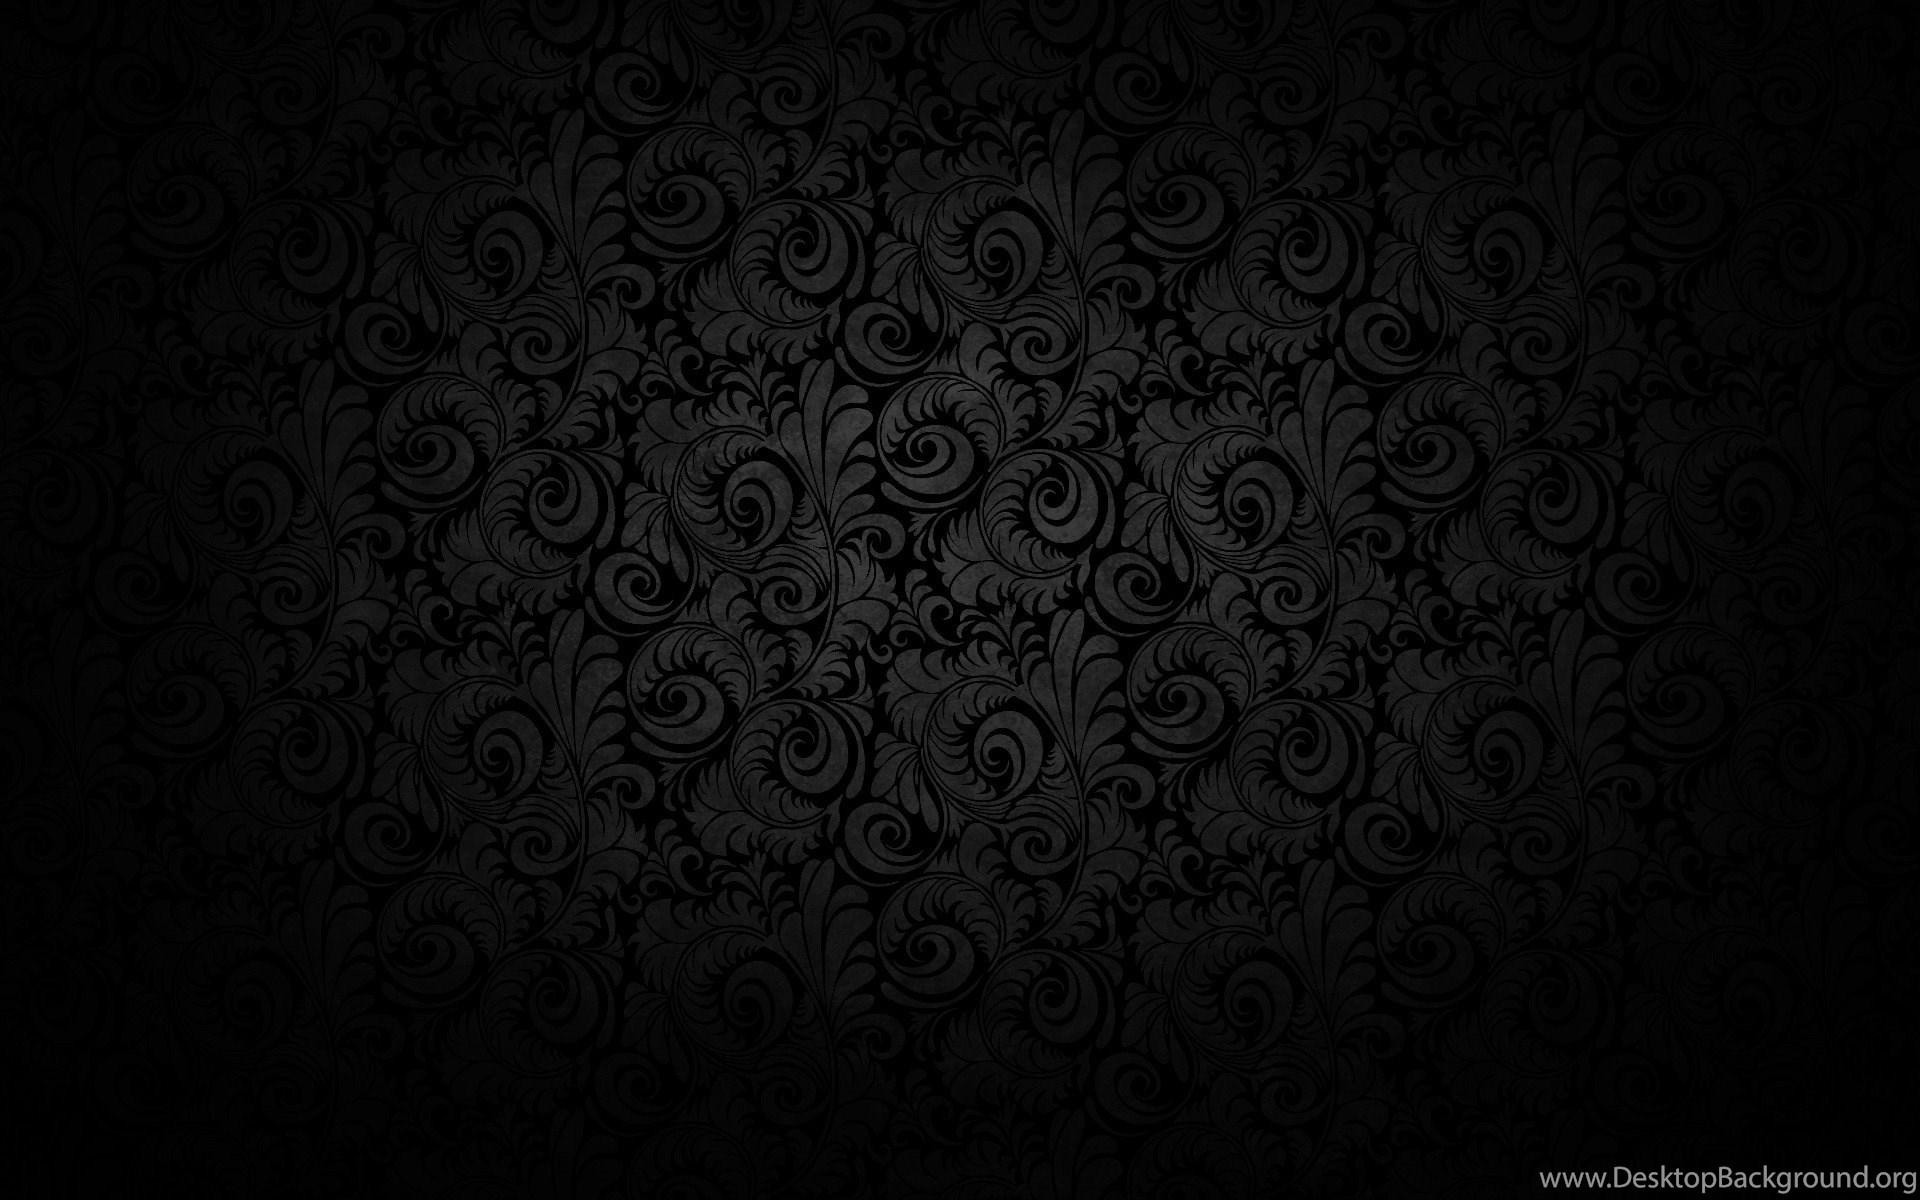 Dark Floral Pattern Desktop Wallpapers The Desktop Background